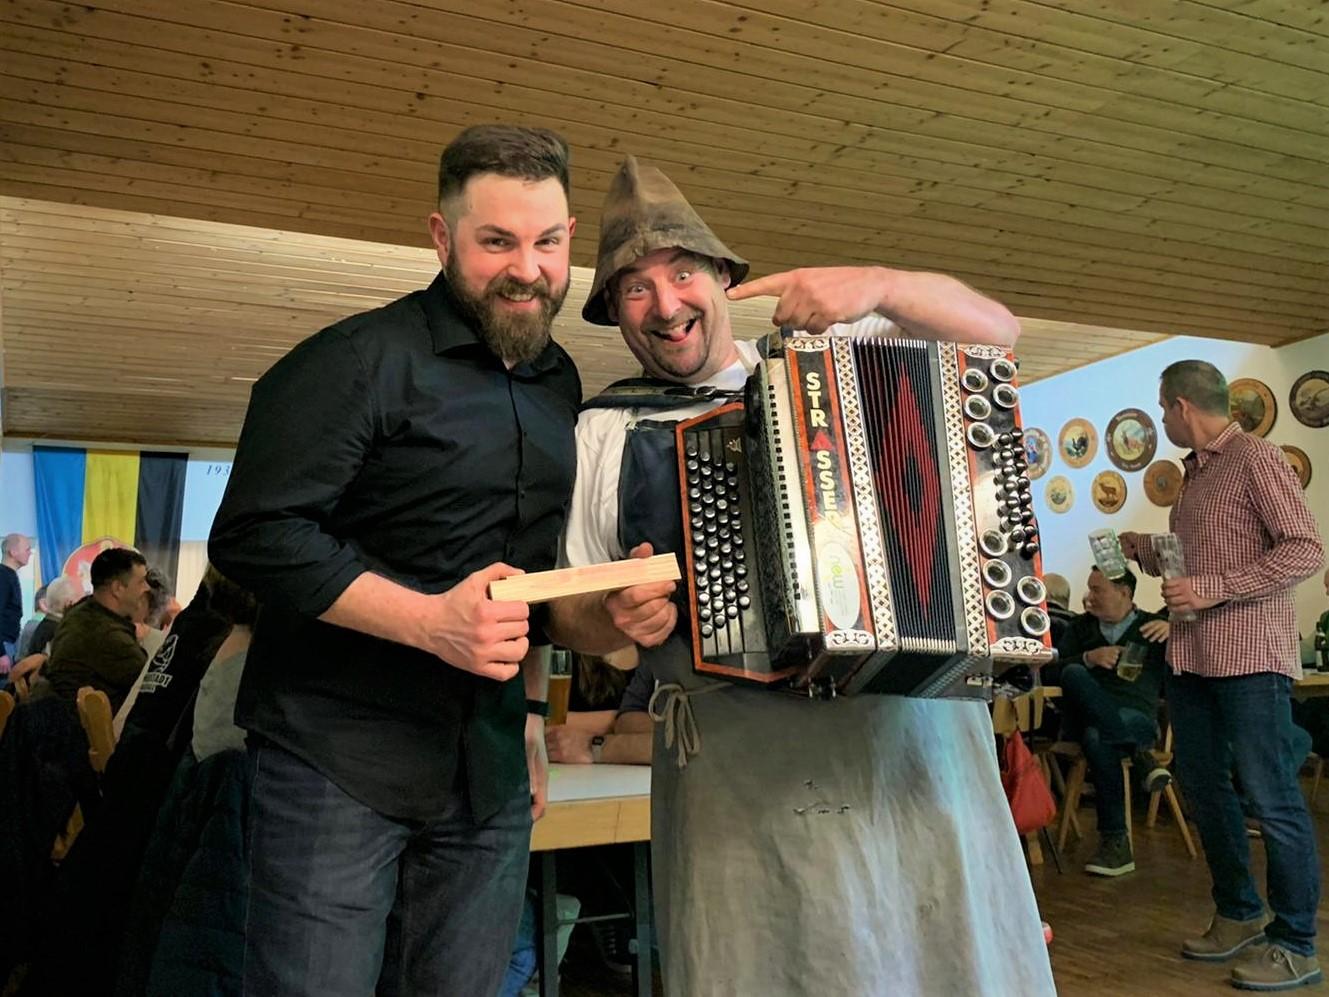 SPD-Bürgermeisterkandidat Sebastian Dippold übergibt Gstanzlsänger Lucky einen Meterstab der Neustädter SPD.